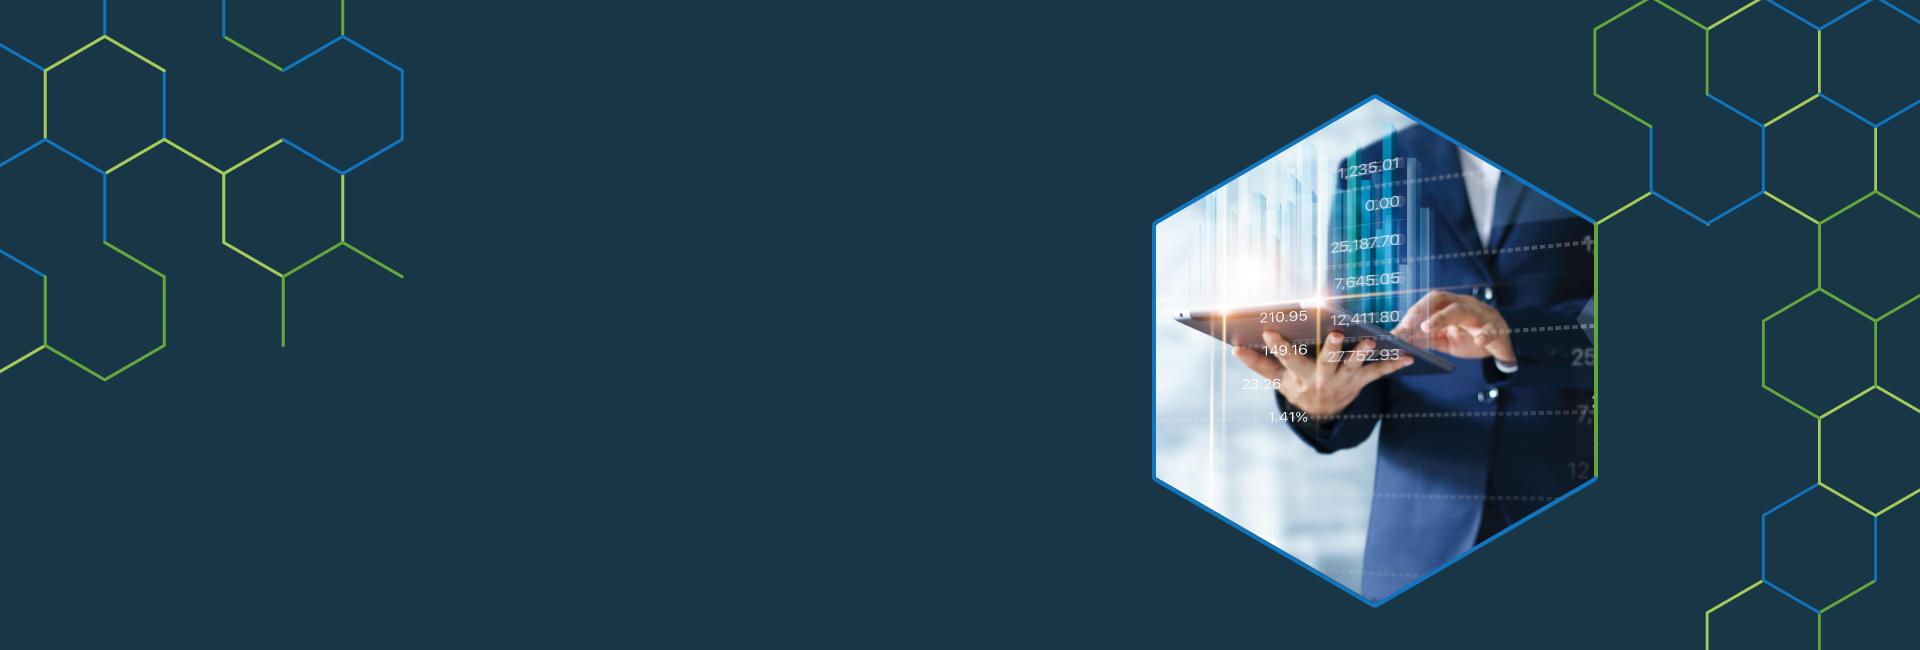 SHS_Webinar-FinTechSystem-1920x650px-2019-05-23-Wabe